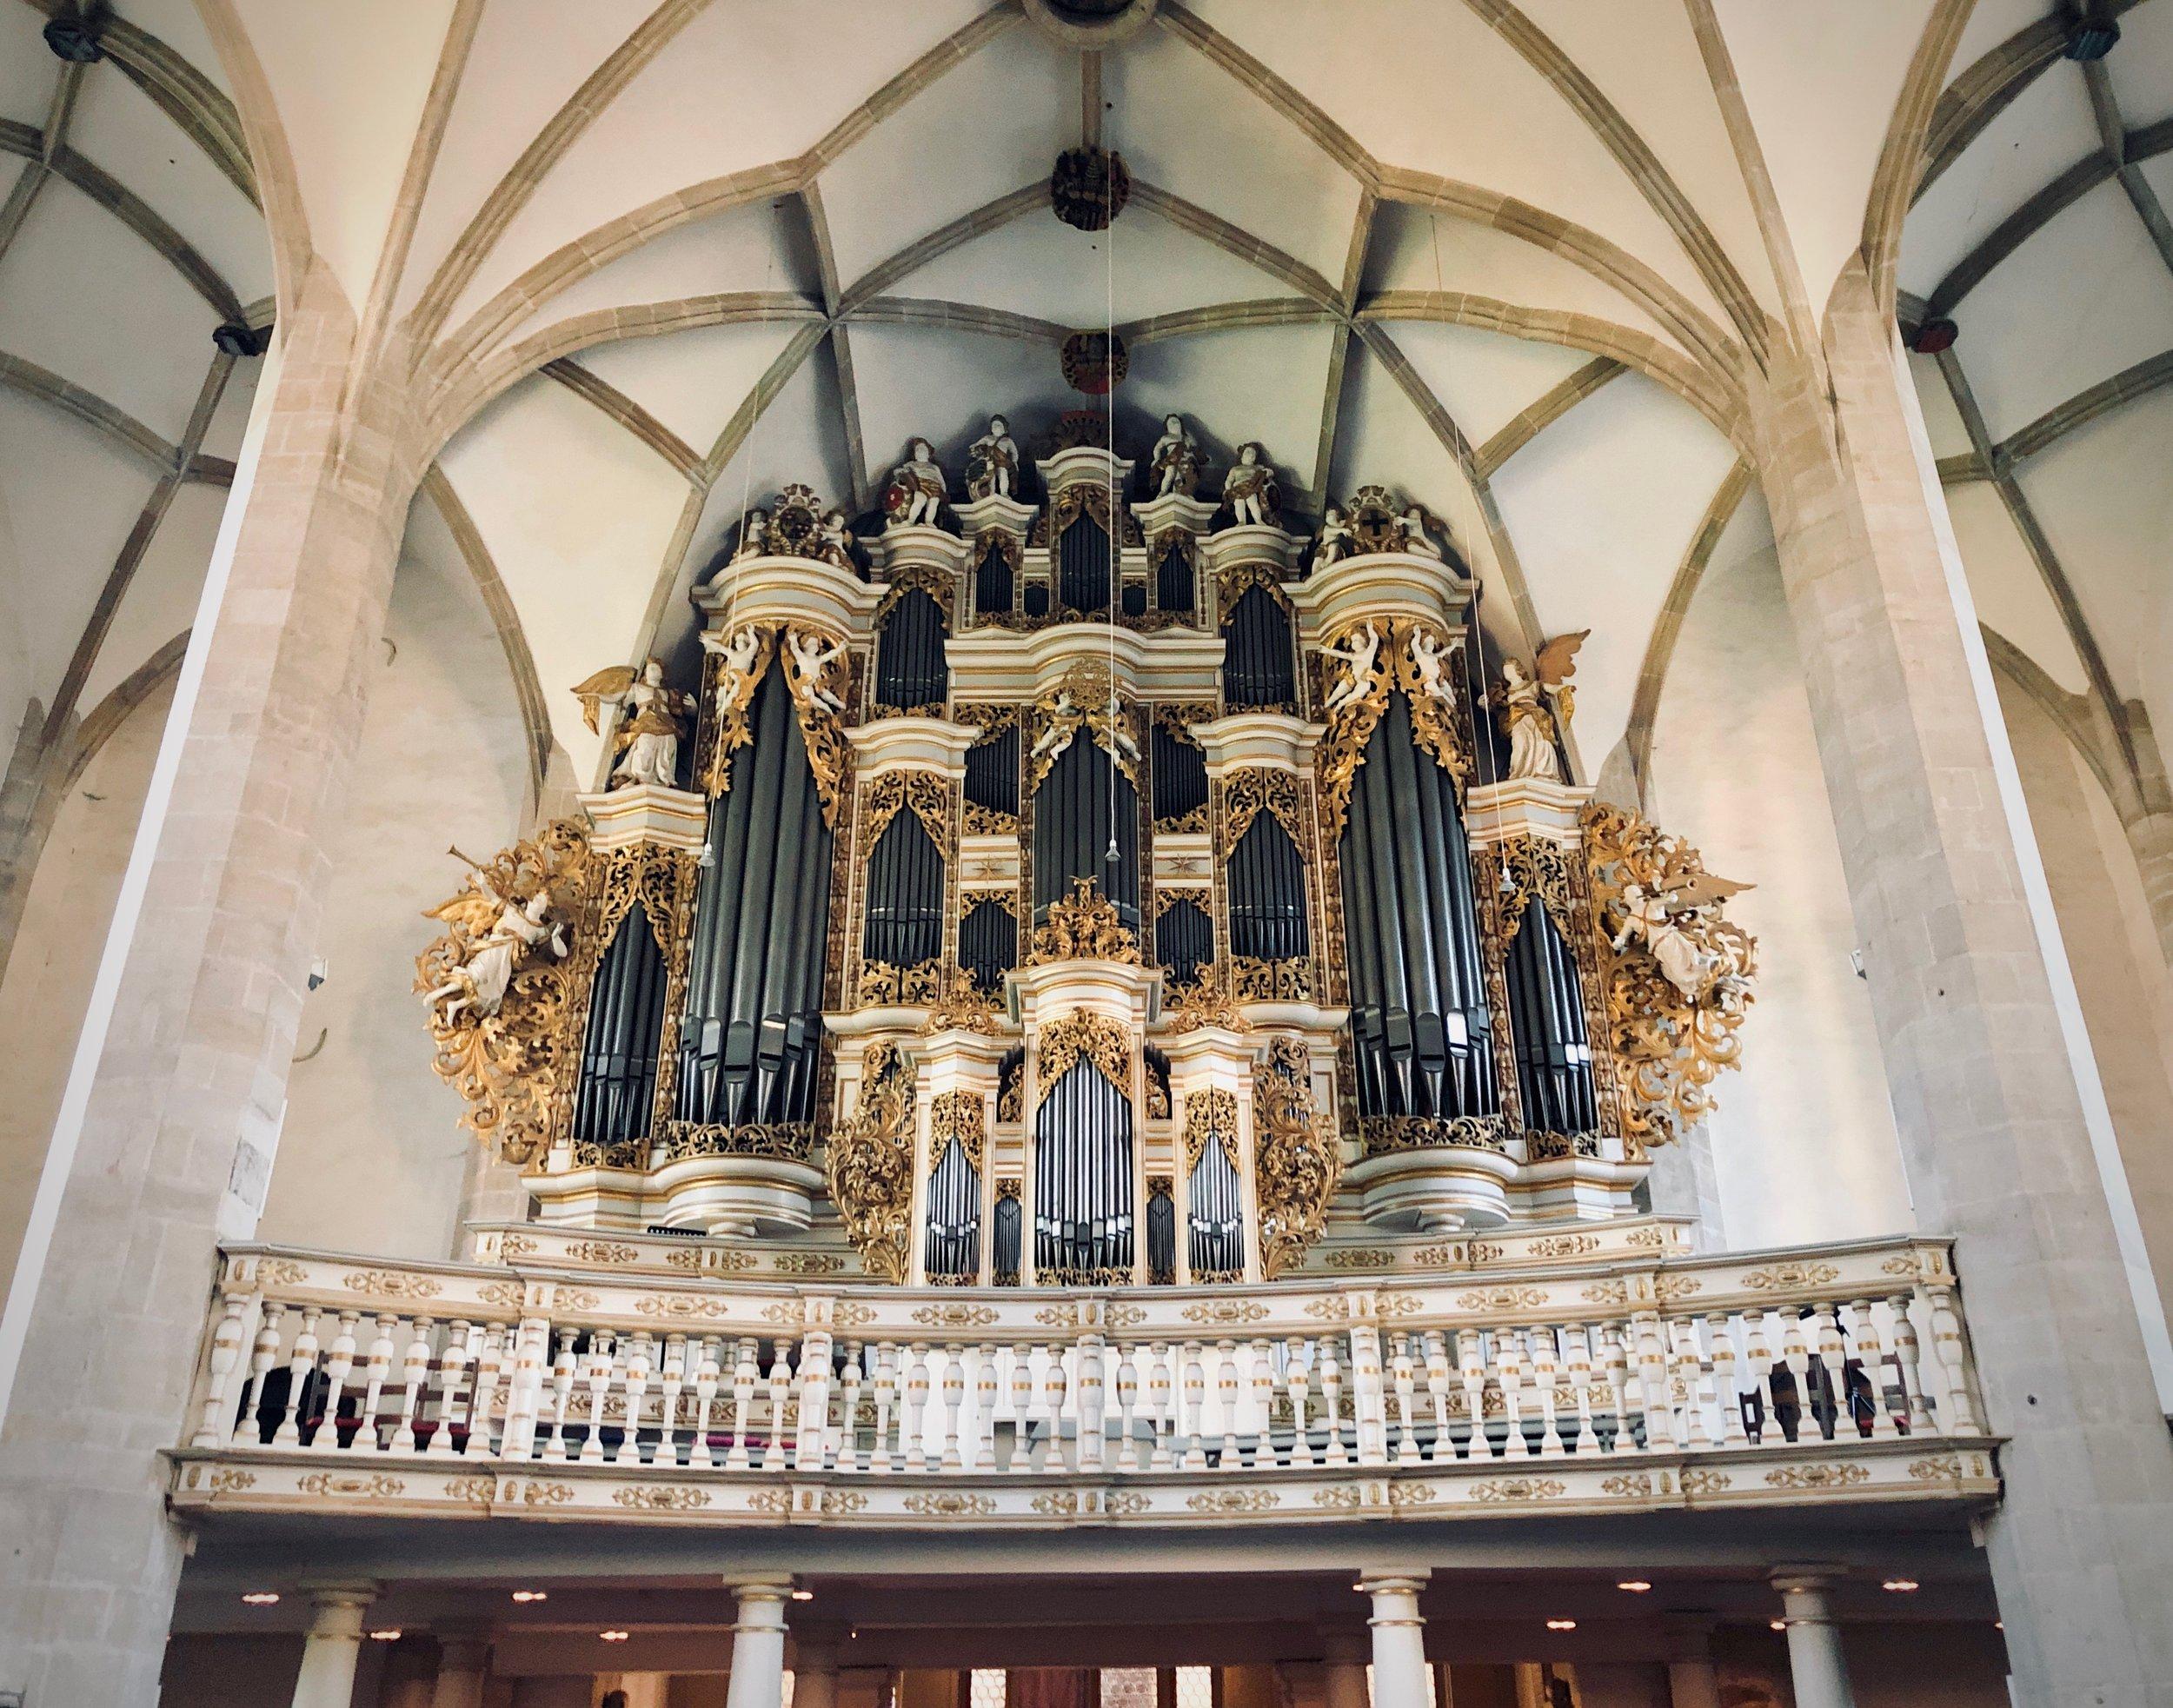 1855 Ladegast Organ, Merseburg Dom.